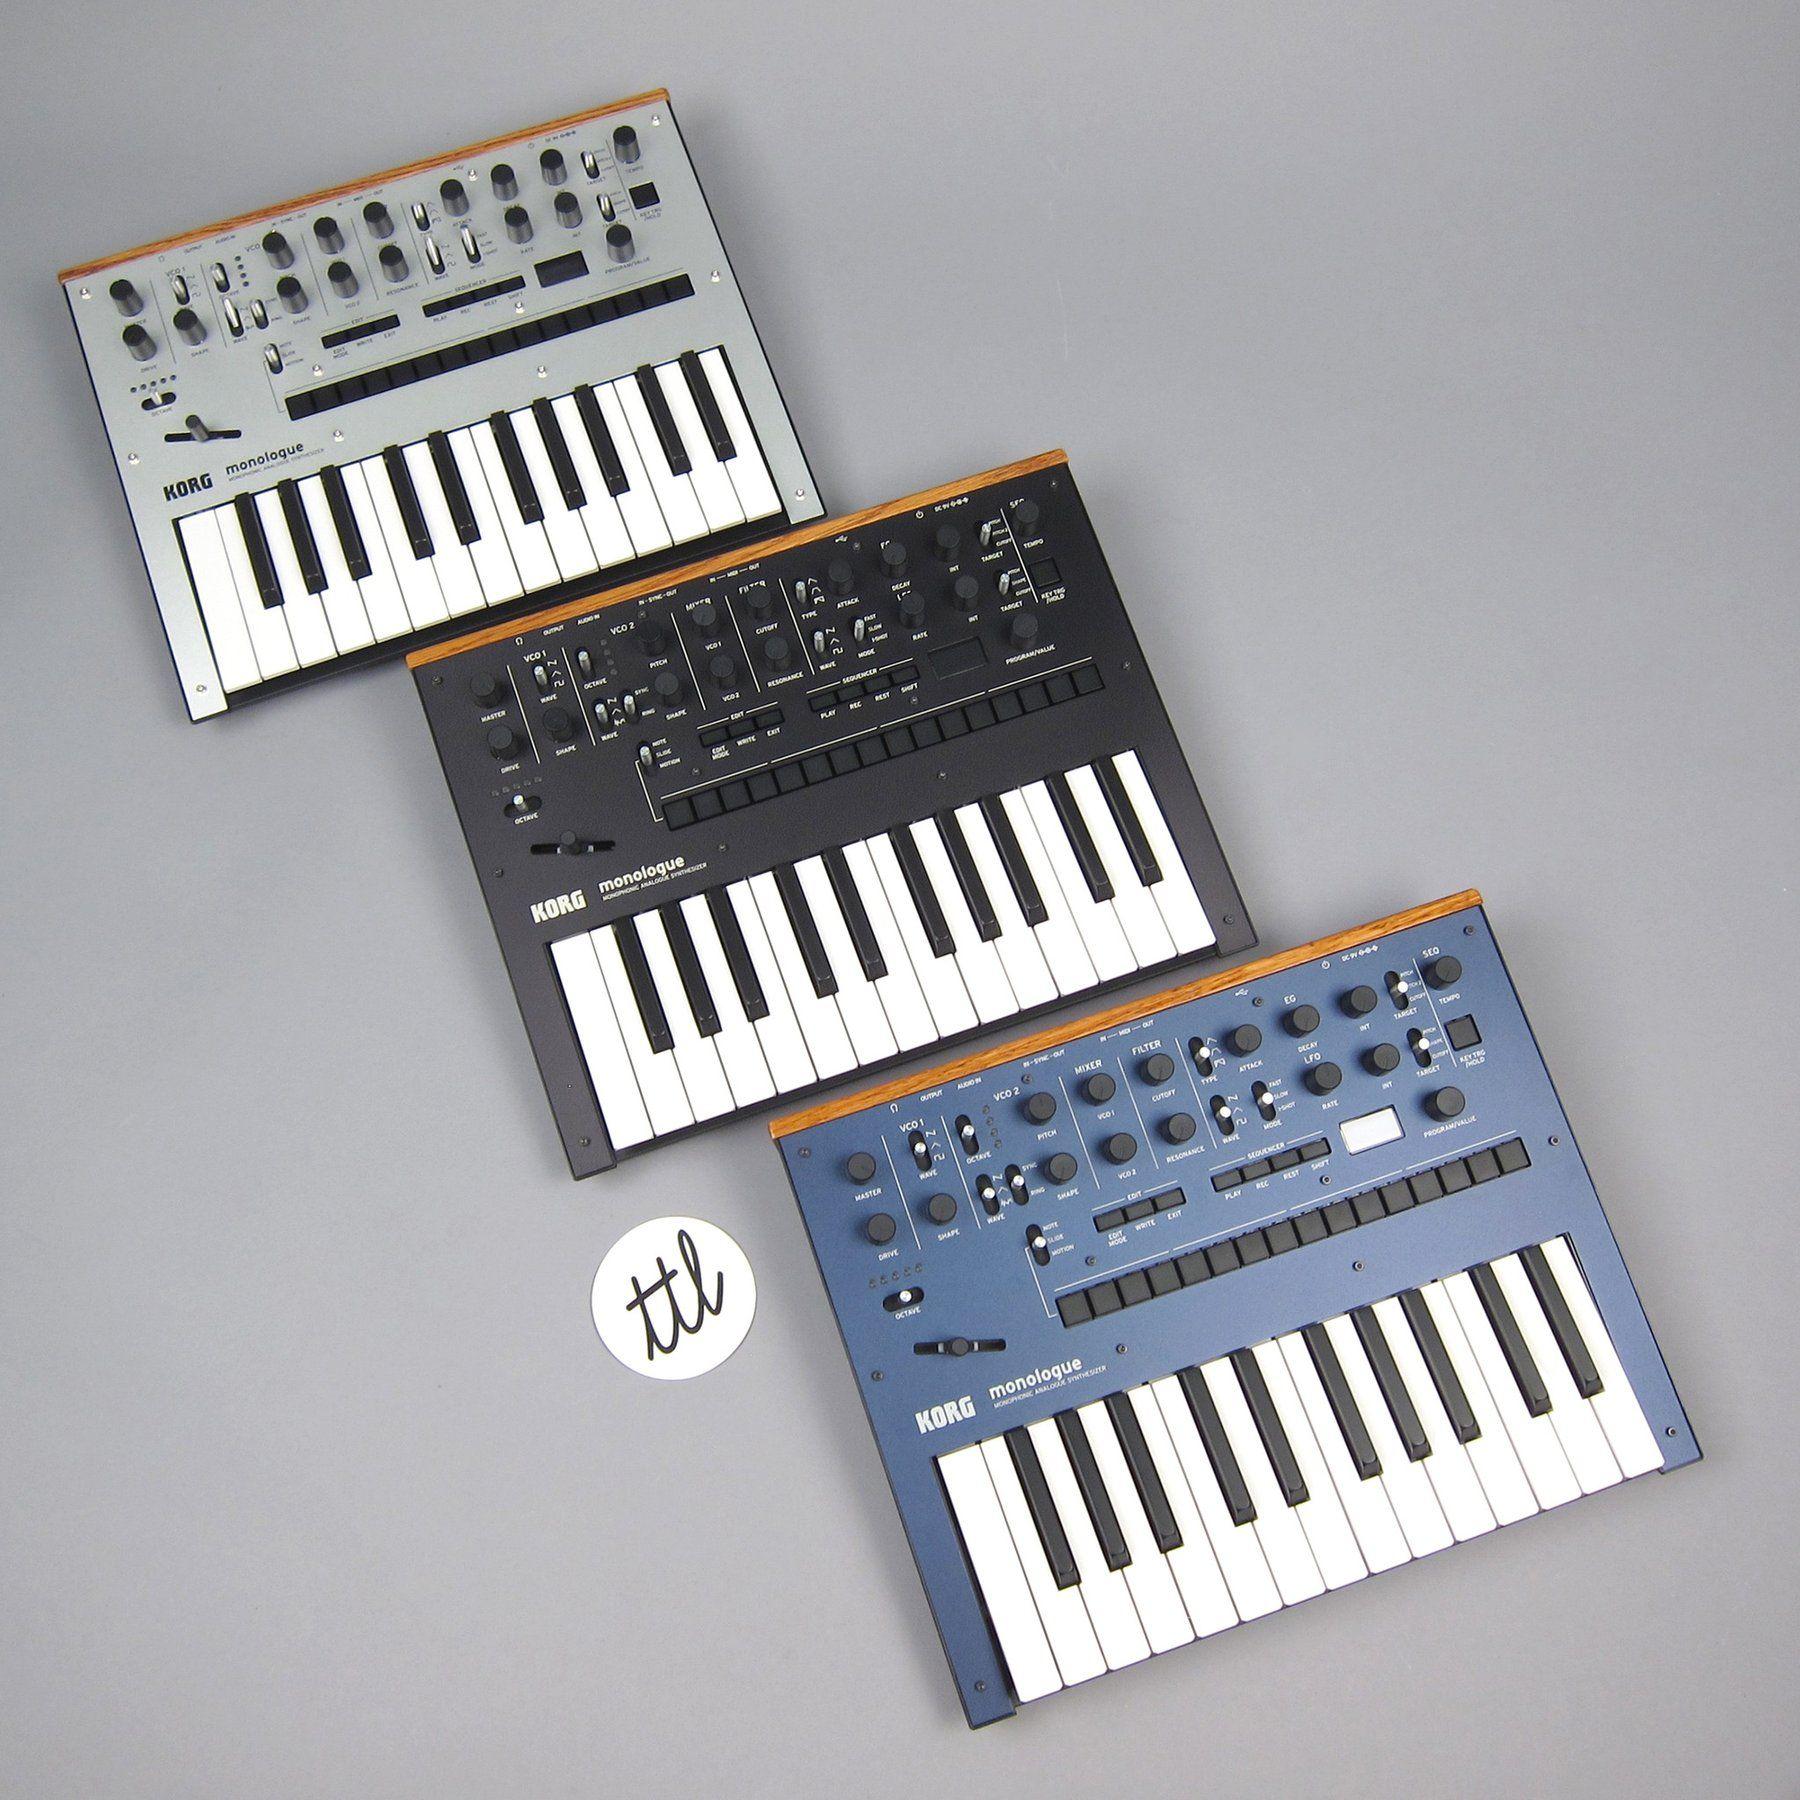 korg monologue monophonic analog synthesizer black music instruments etc in 2019 vintage. Black Bedroom Furniture Sets. Home Design Ideas